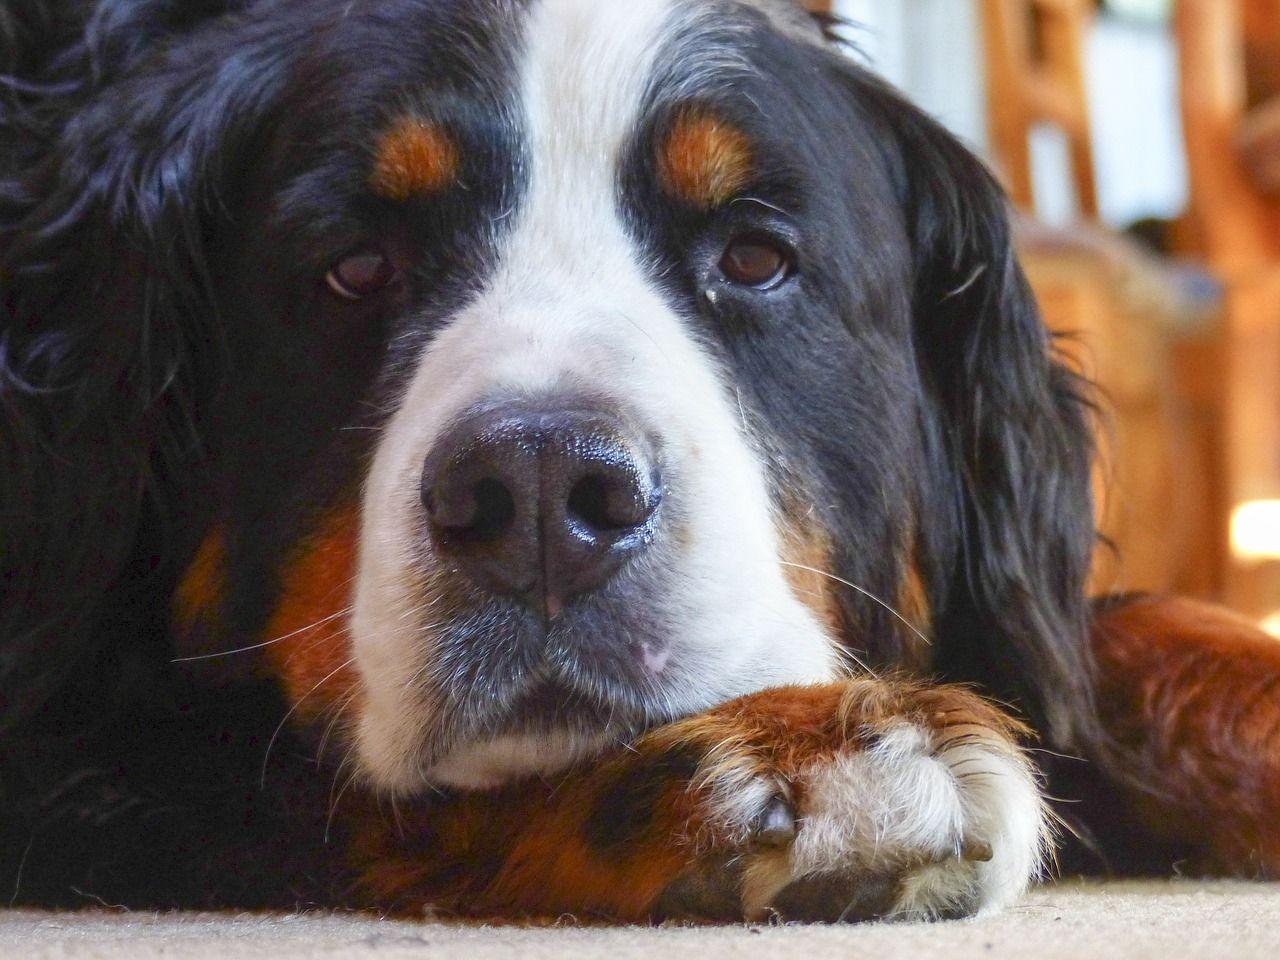 Kostenloses Bild Auf Pixabay Berner Sennenhund Hund Ruhend Berner Sennenhund Bernasennen Hund Und Sennenhund